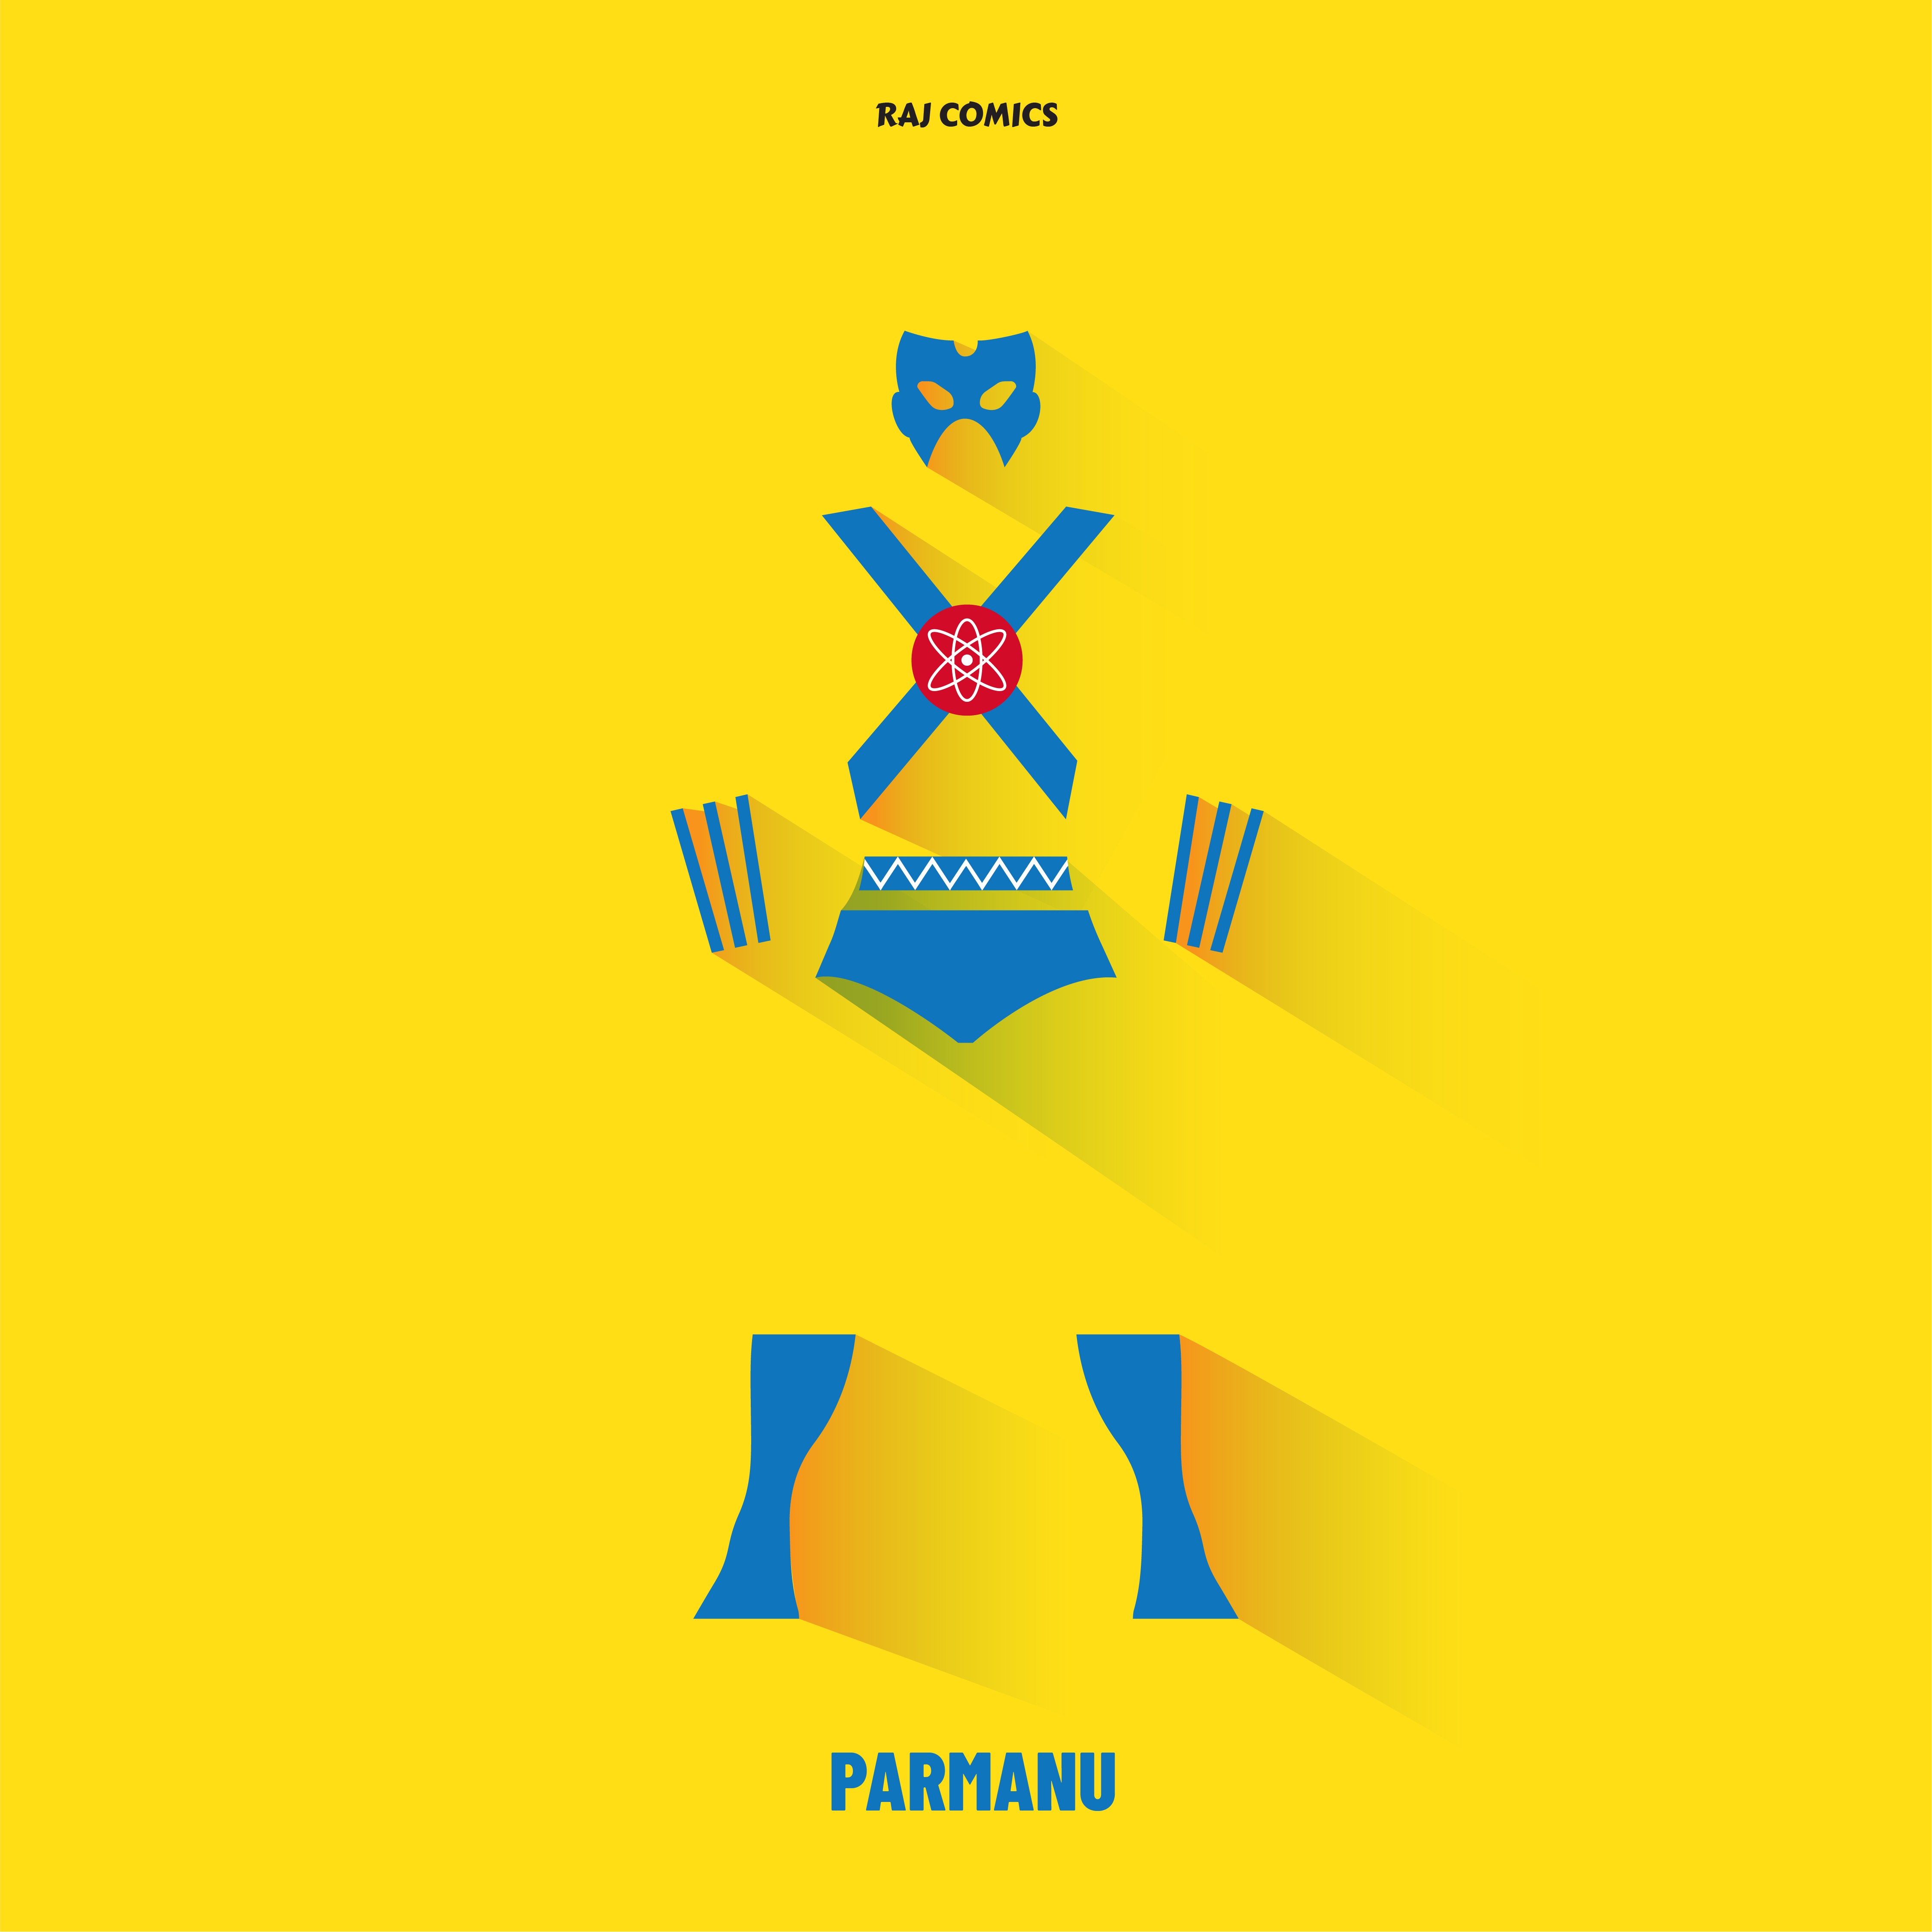 raj comics poster